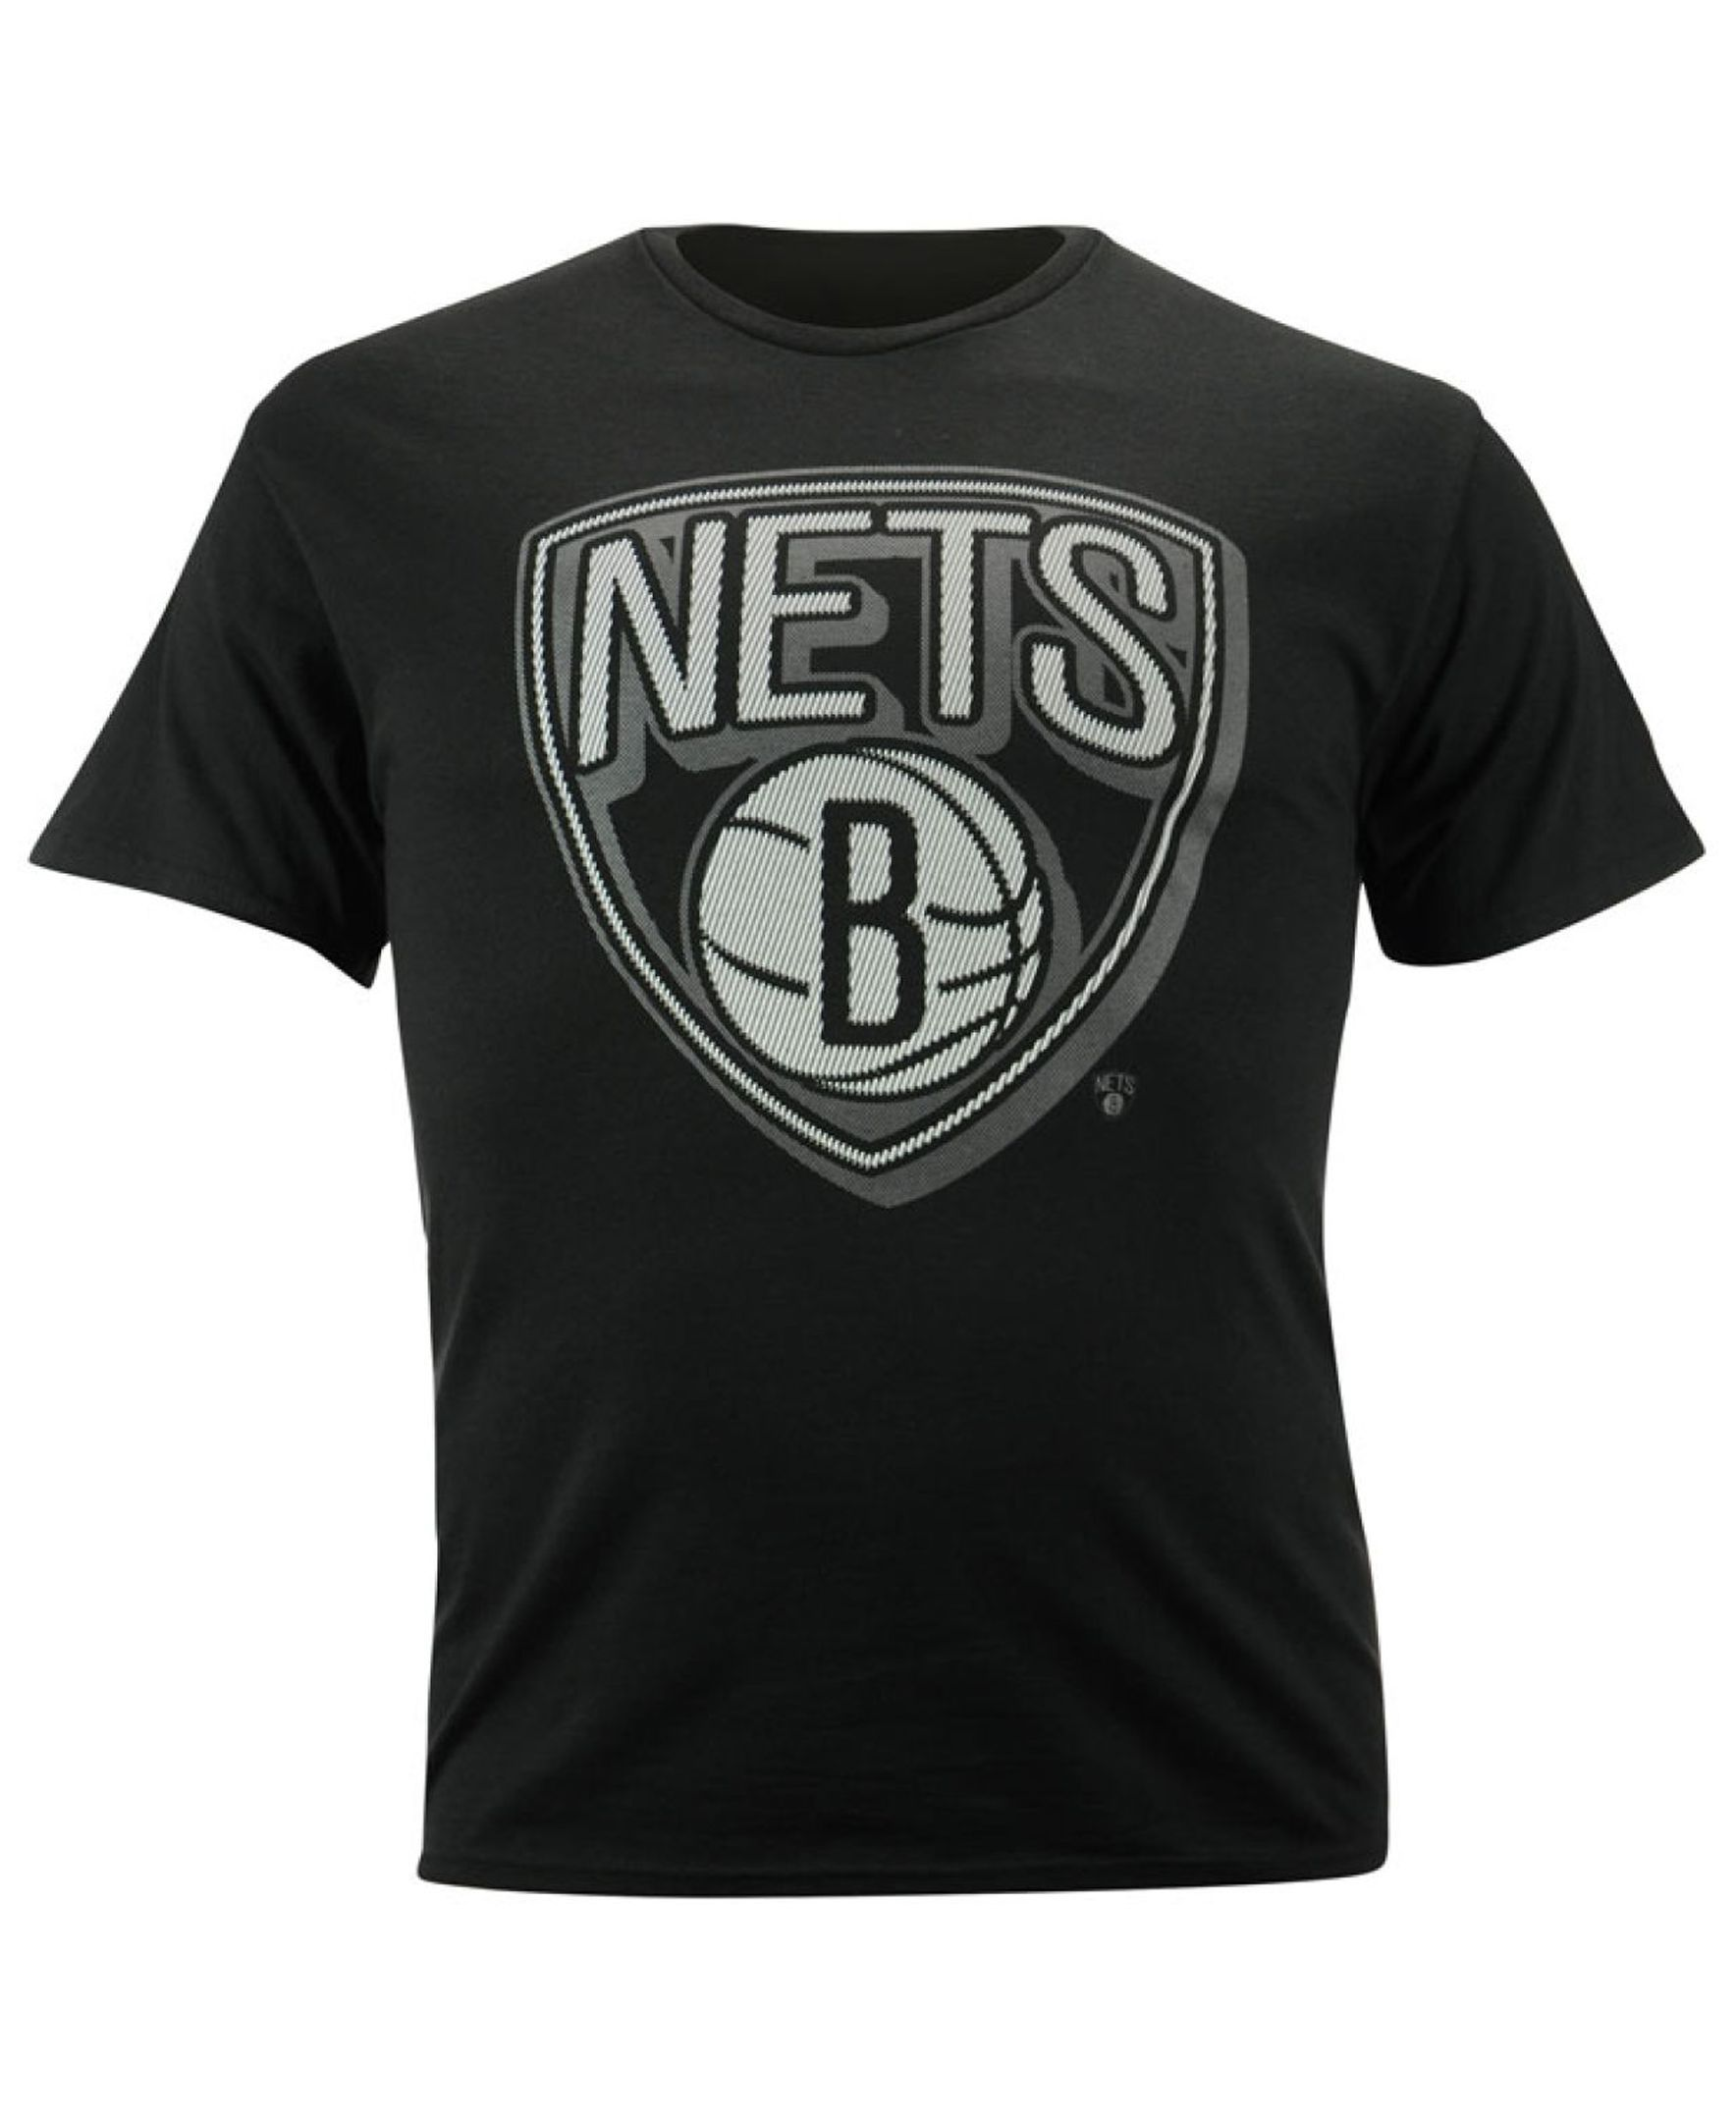 Unk Men's Brooklyn Nets Blurred Lines TShirt Shirts